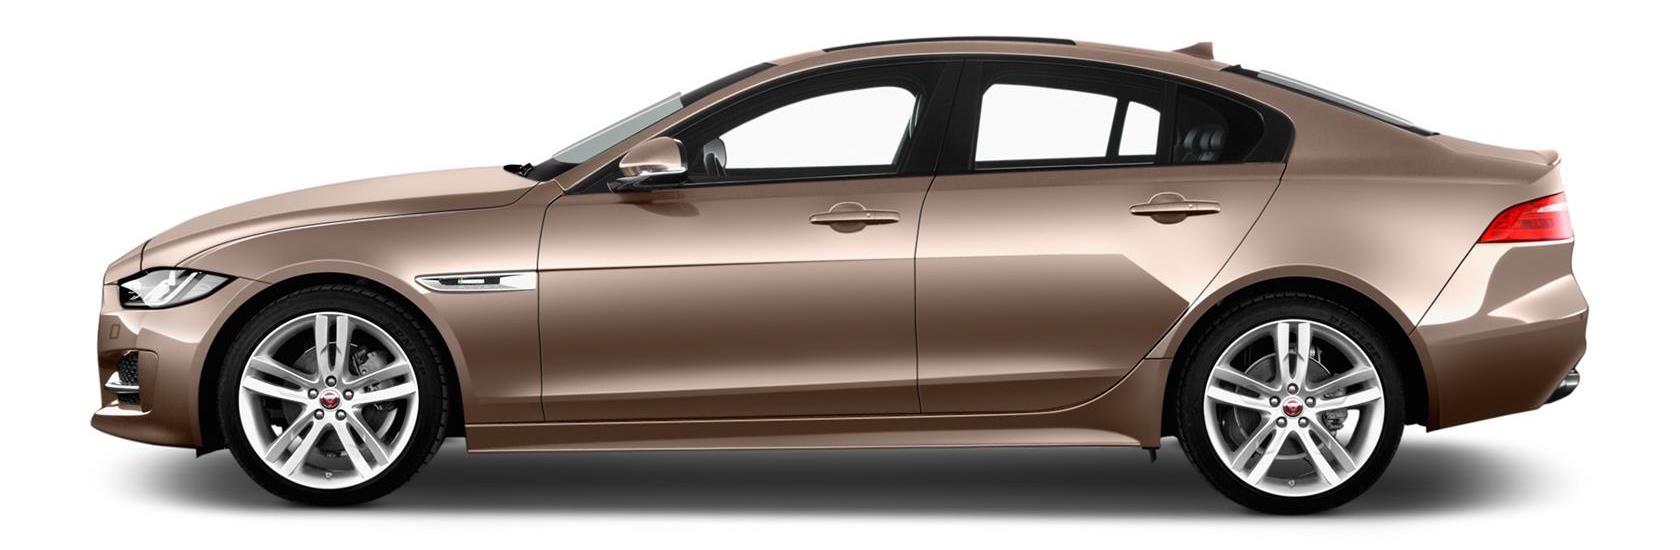 prix jaguar xe 2 0 turbo pure bva a partir de 137 700 dt. Black Bedroom Furniture Sets. Home Design Ideas